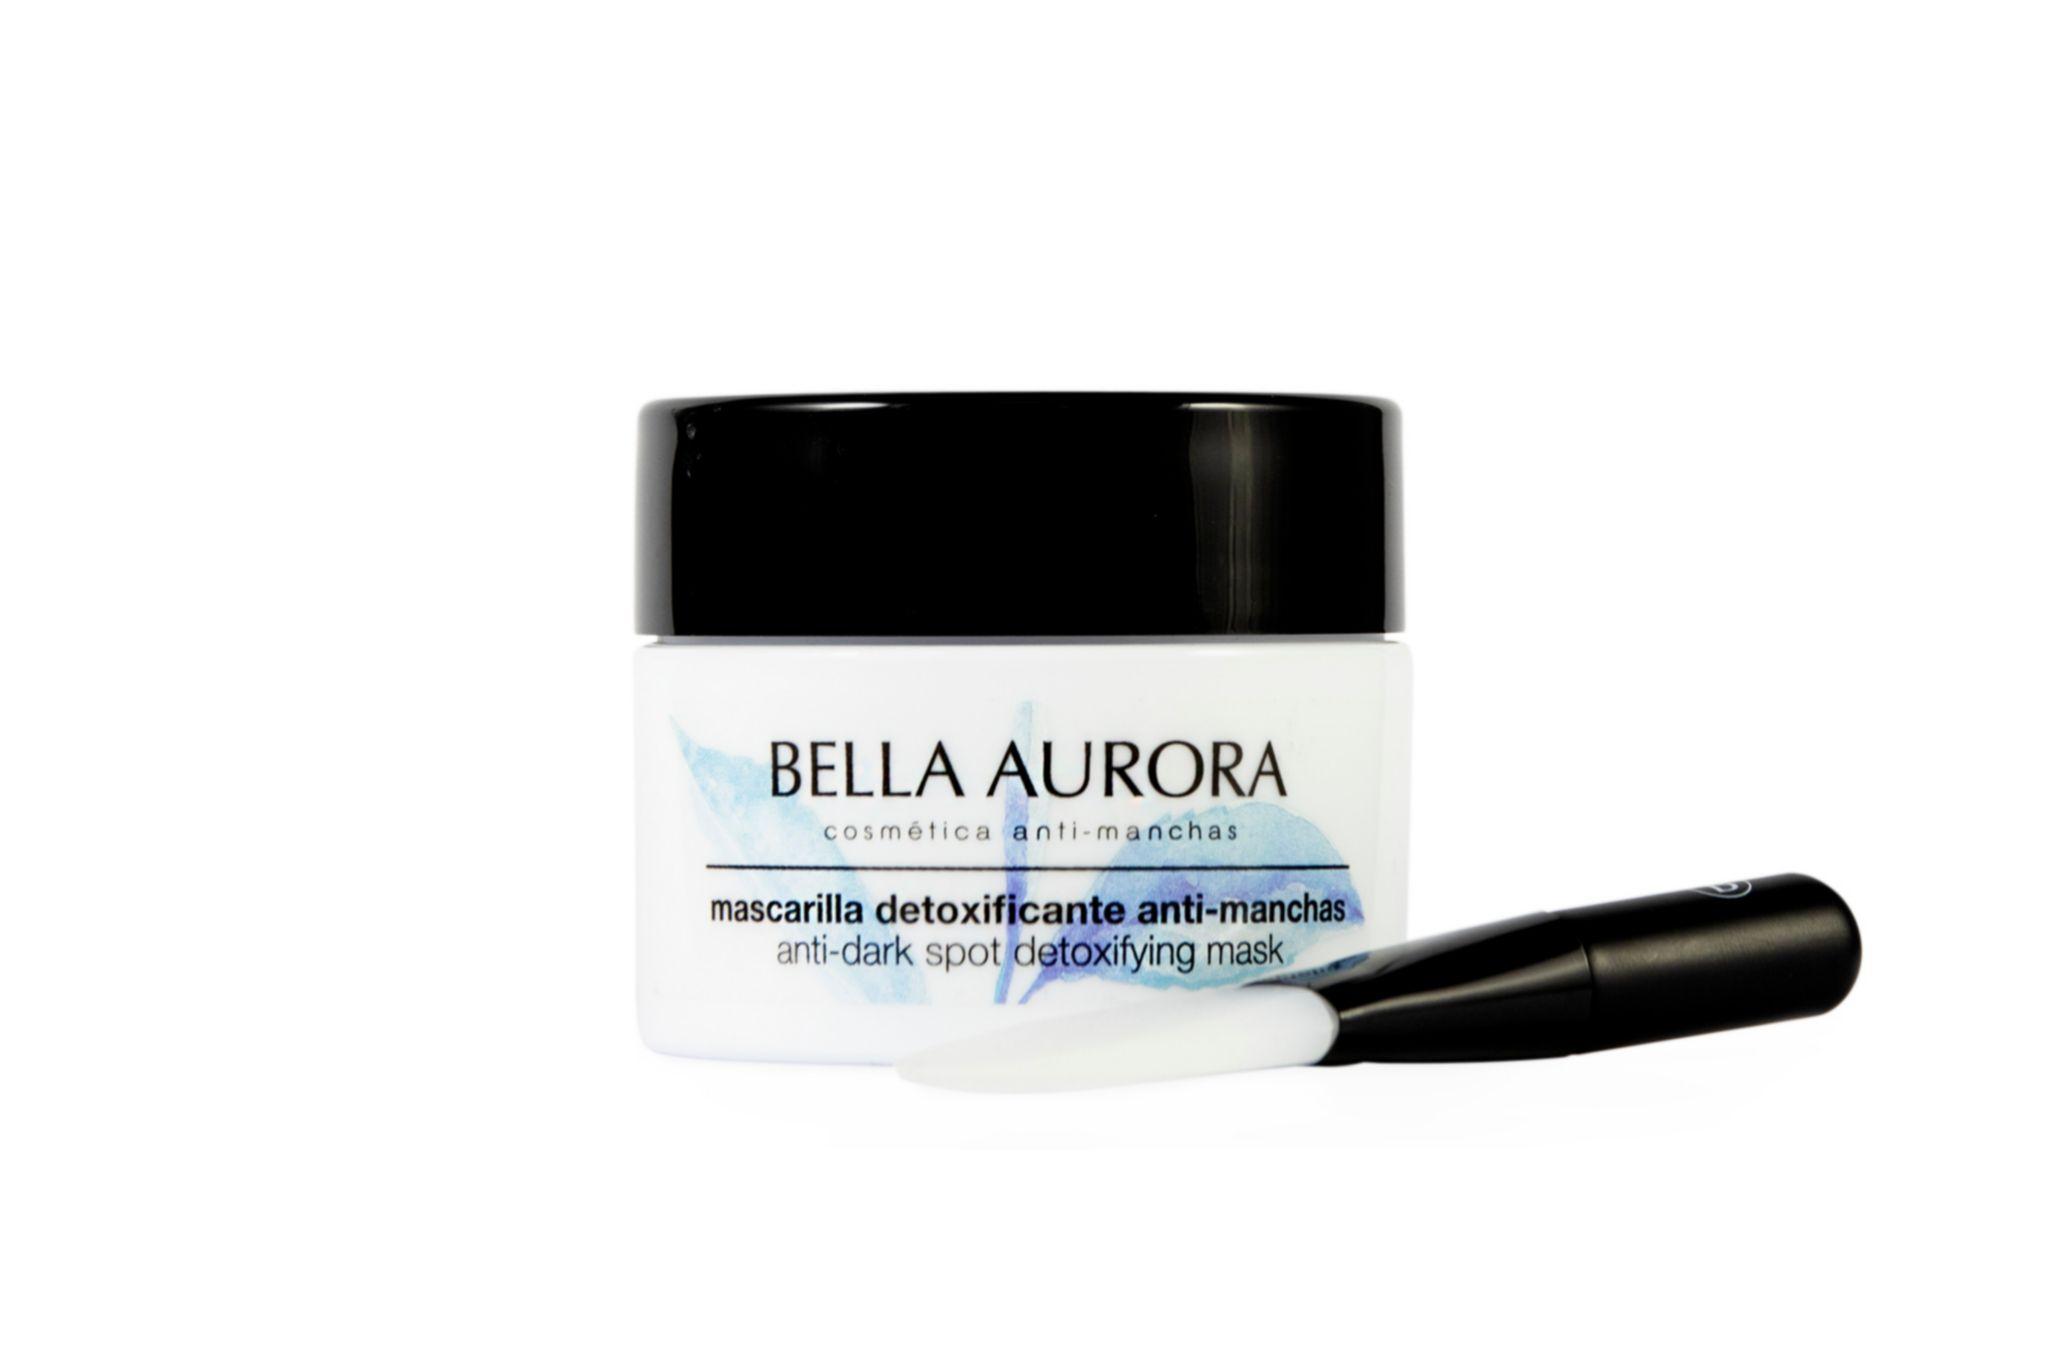 Mascarilla detoxificante anti-manchas, Bella Aurora (23 euros).